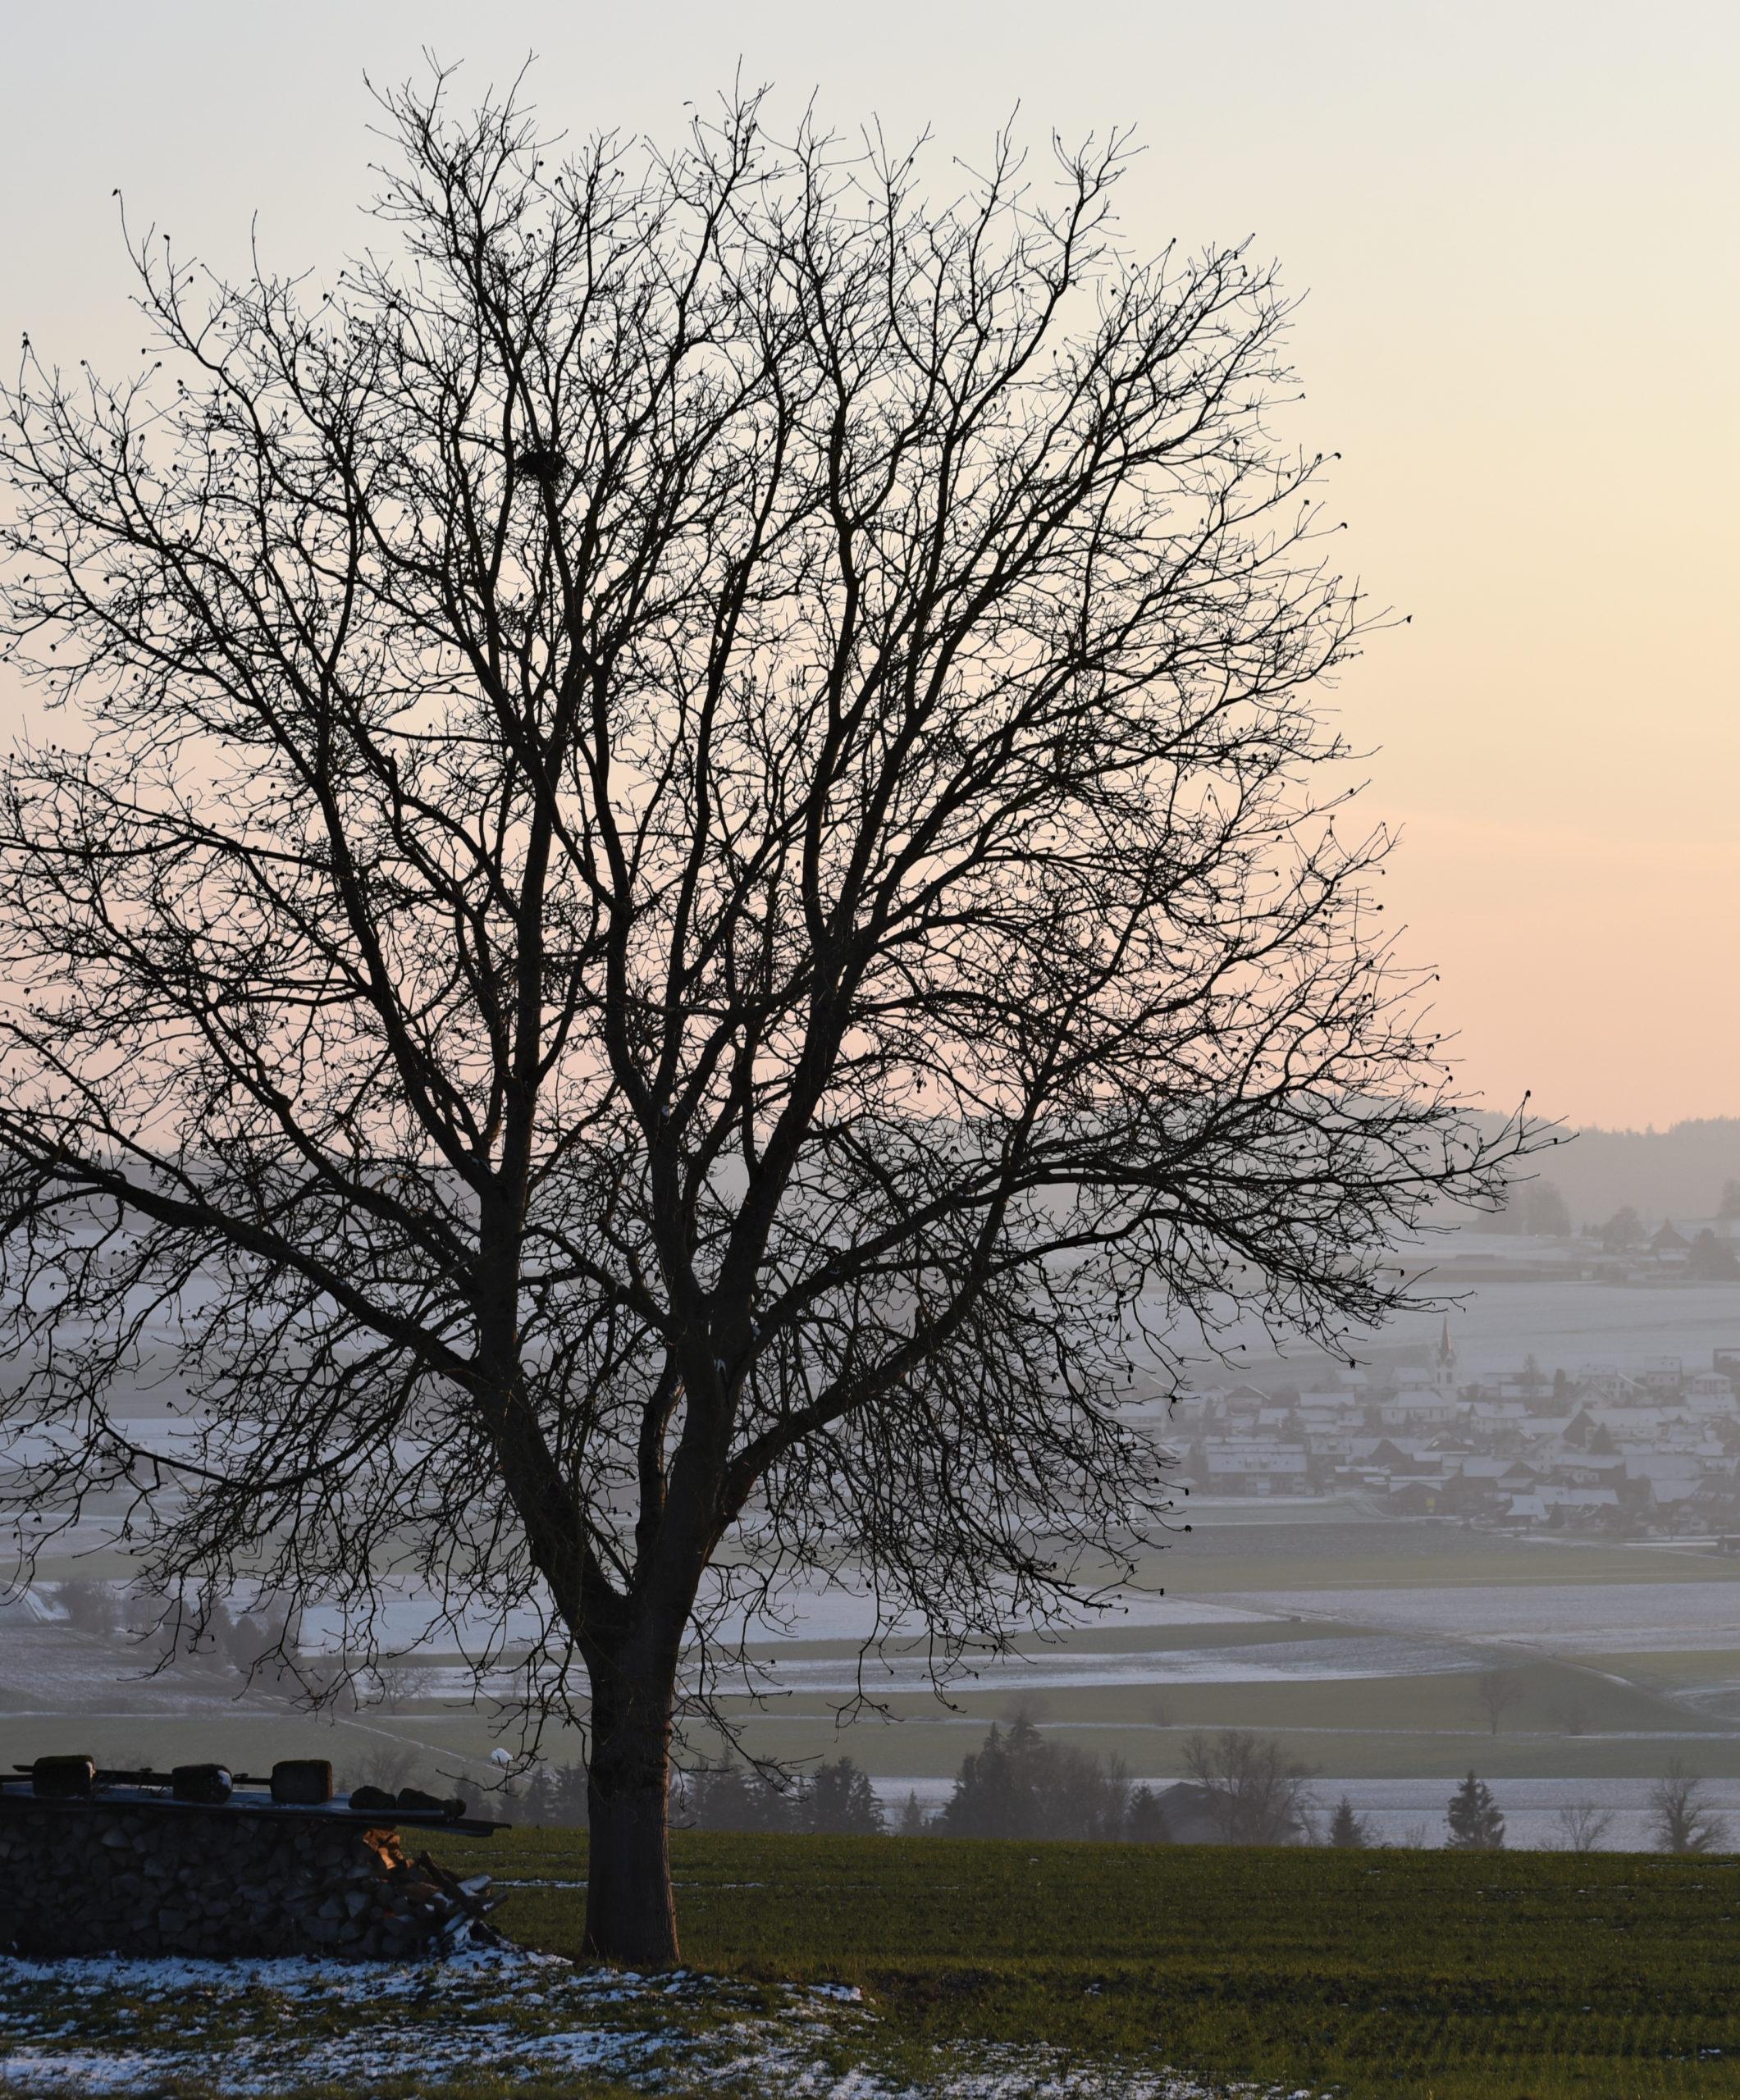 Photograph of walnut tree backlit with misty sunrise